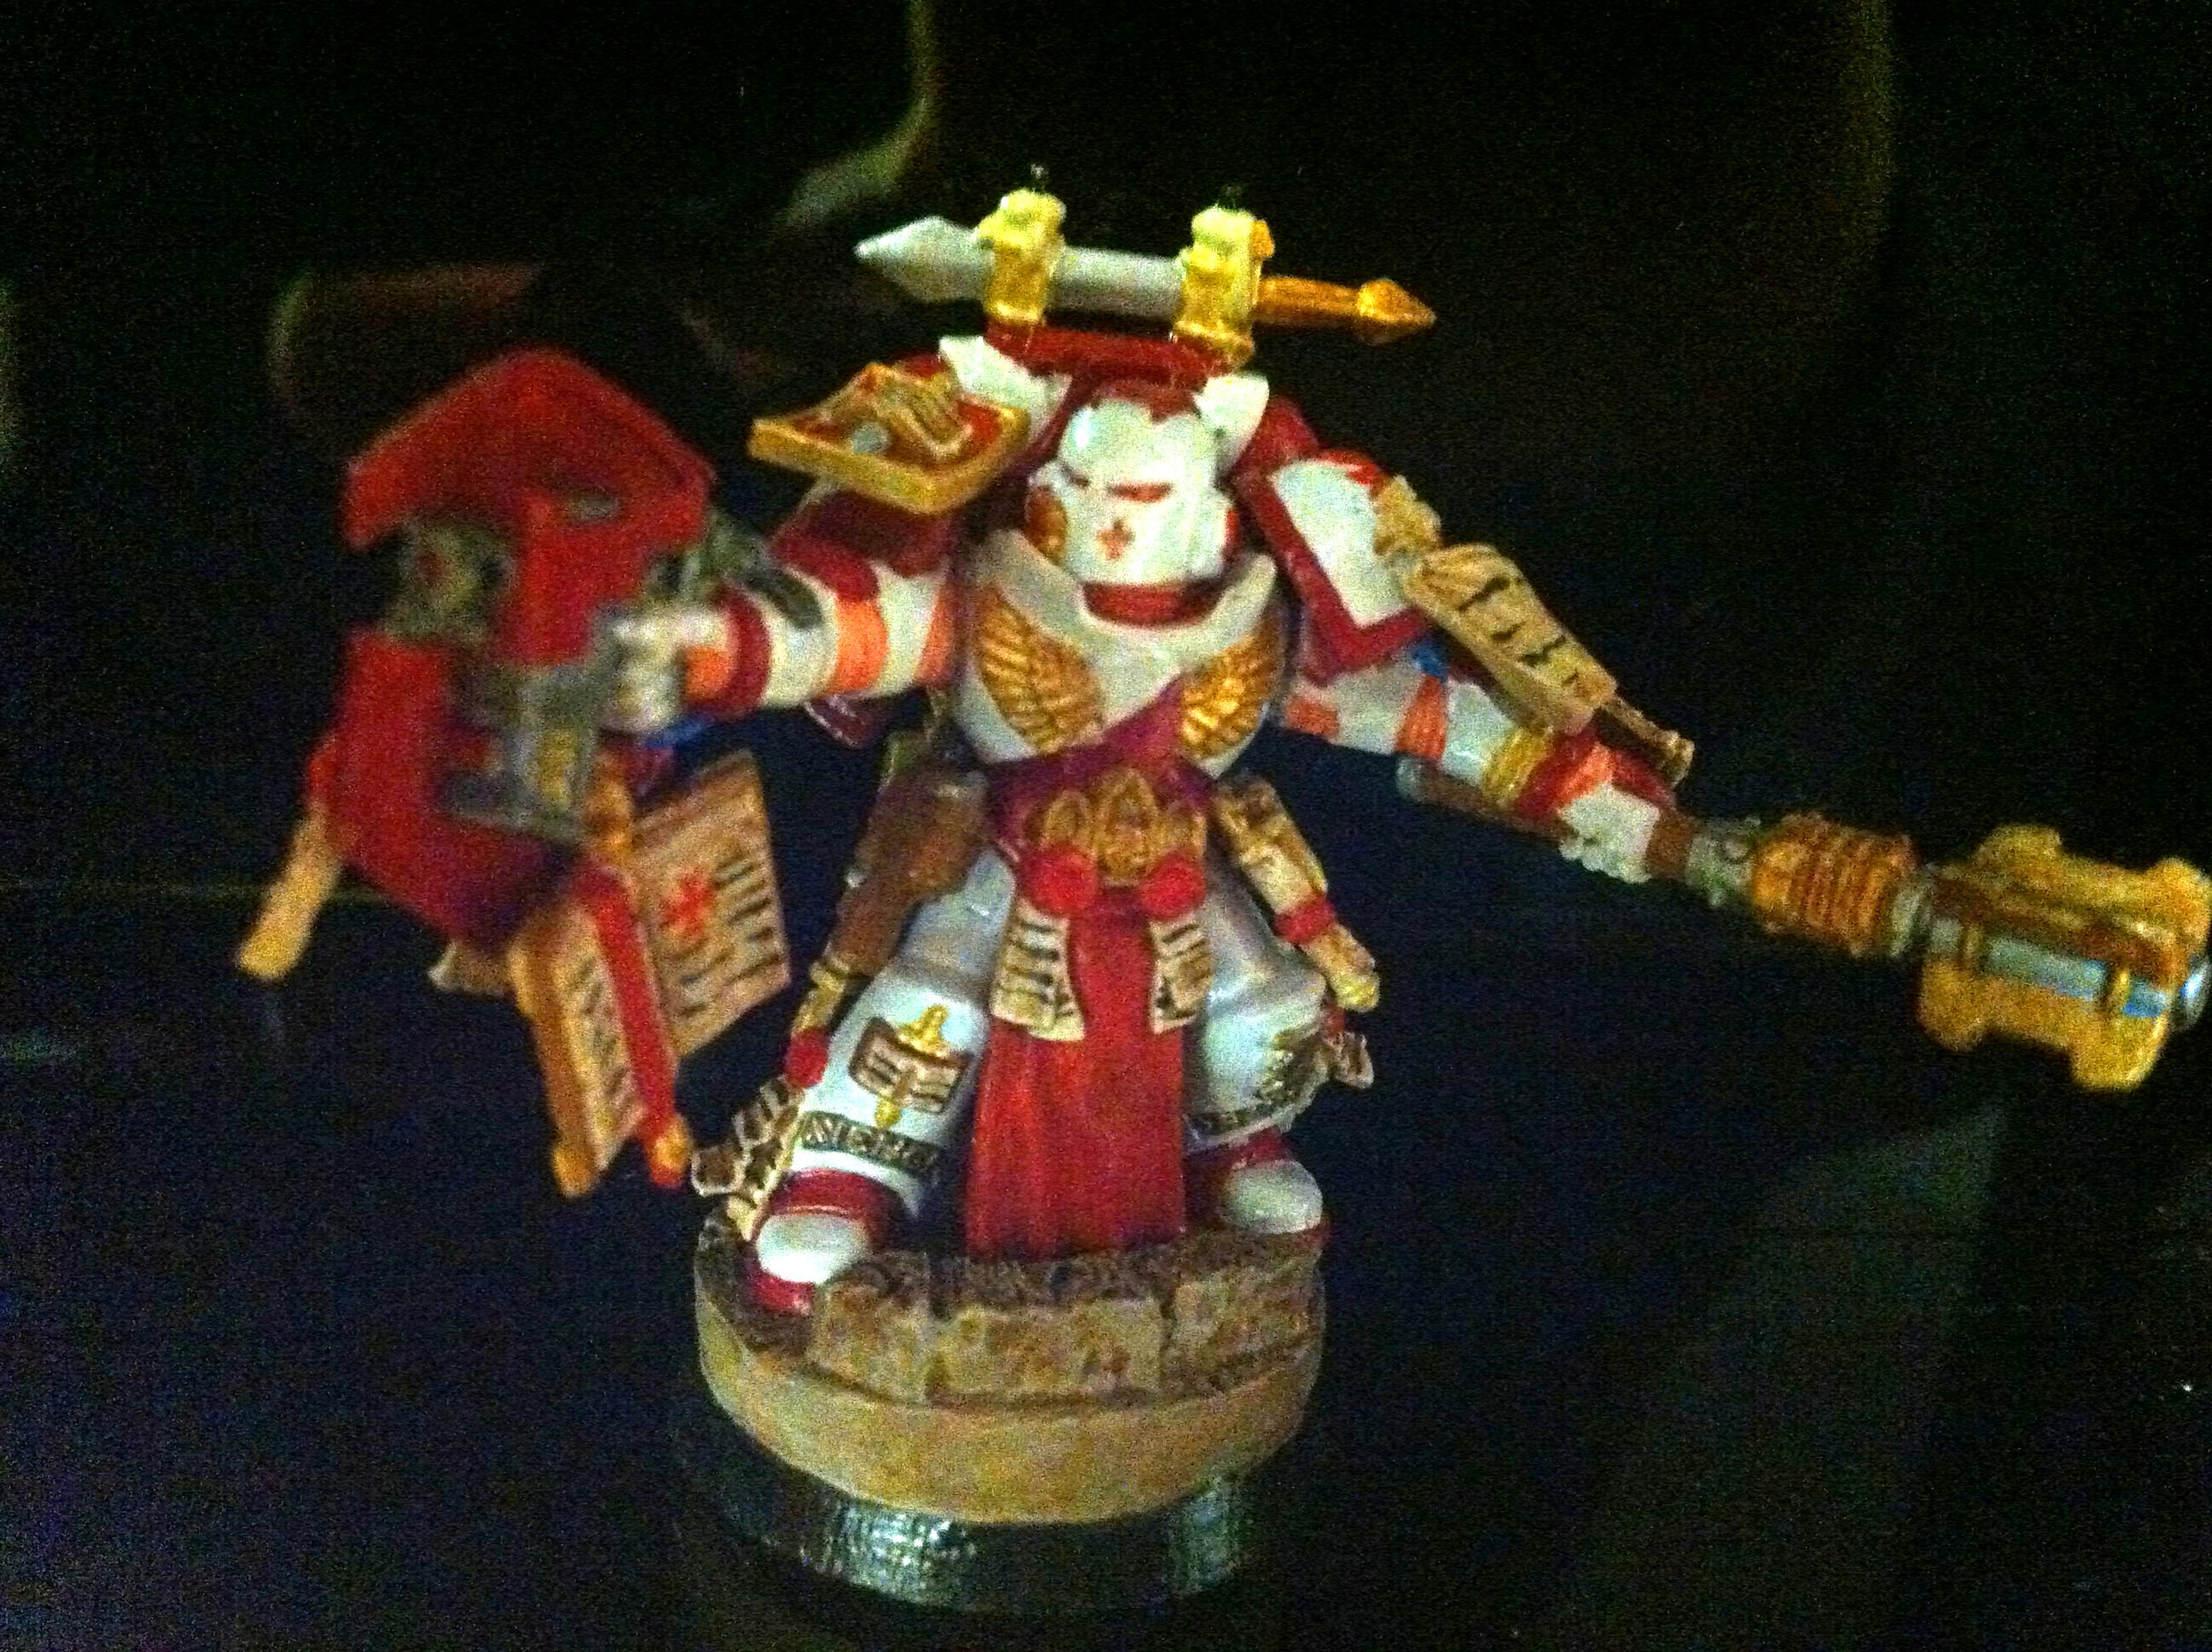 Space Marines, Templars, Warhammer 40,000